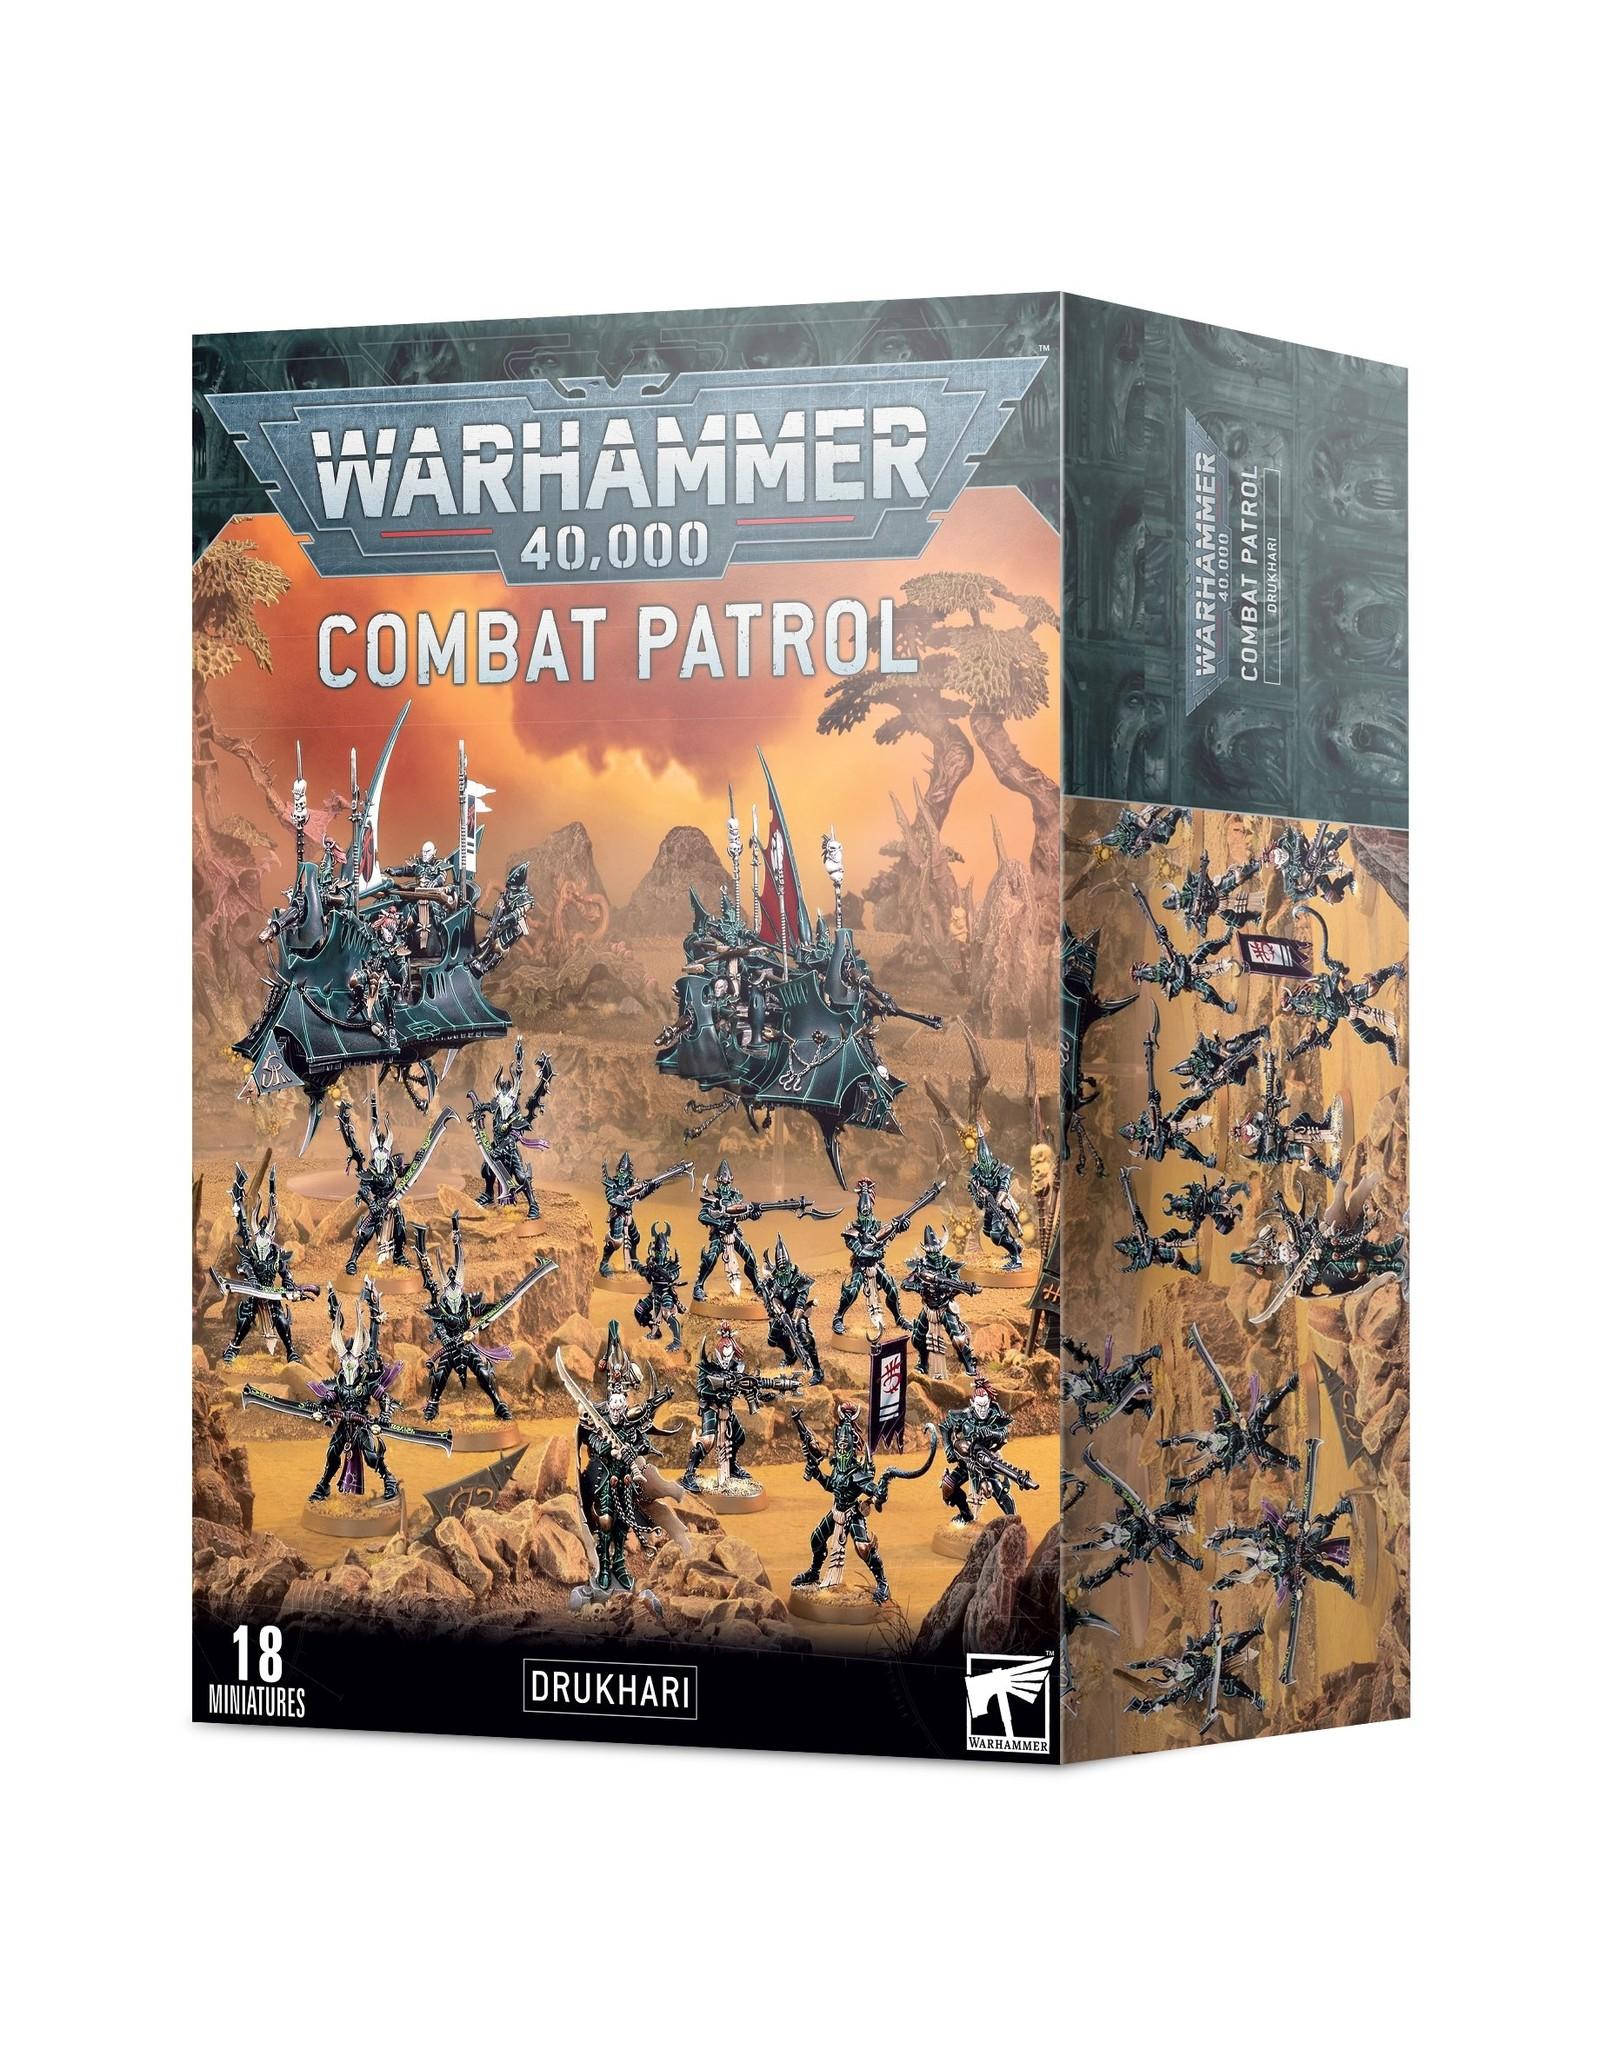 Warhammer 40K Combat Patrol: Drukhari